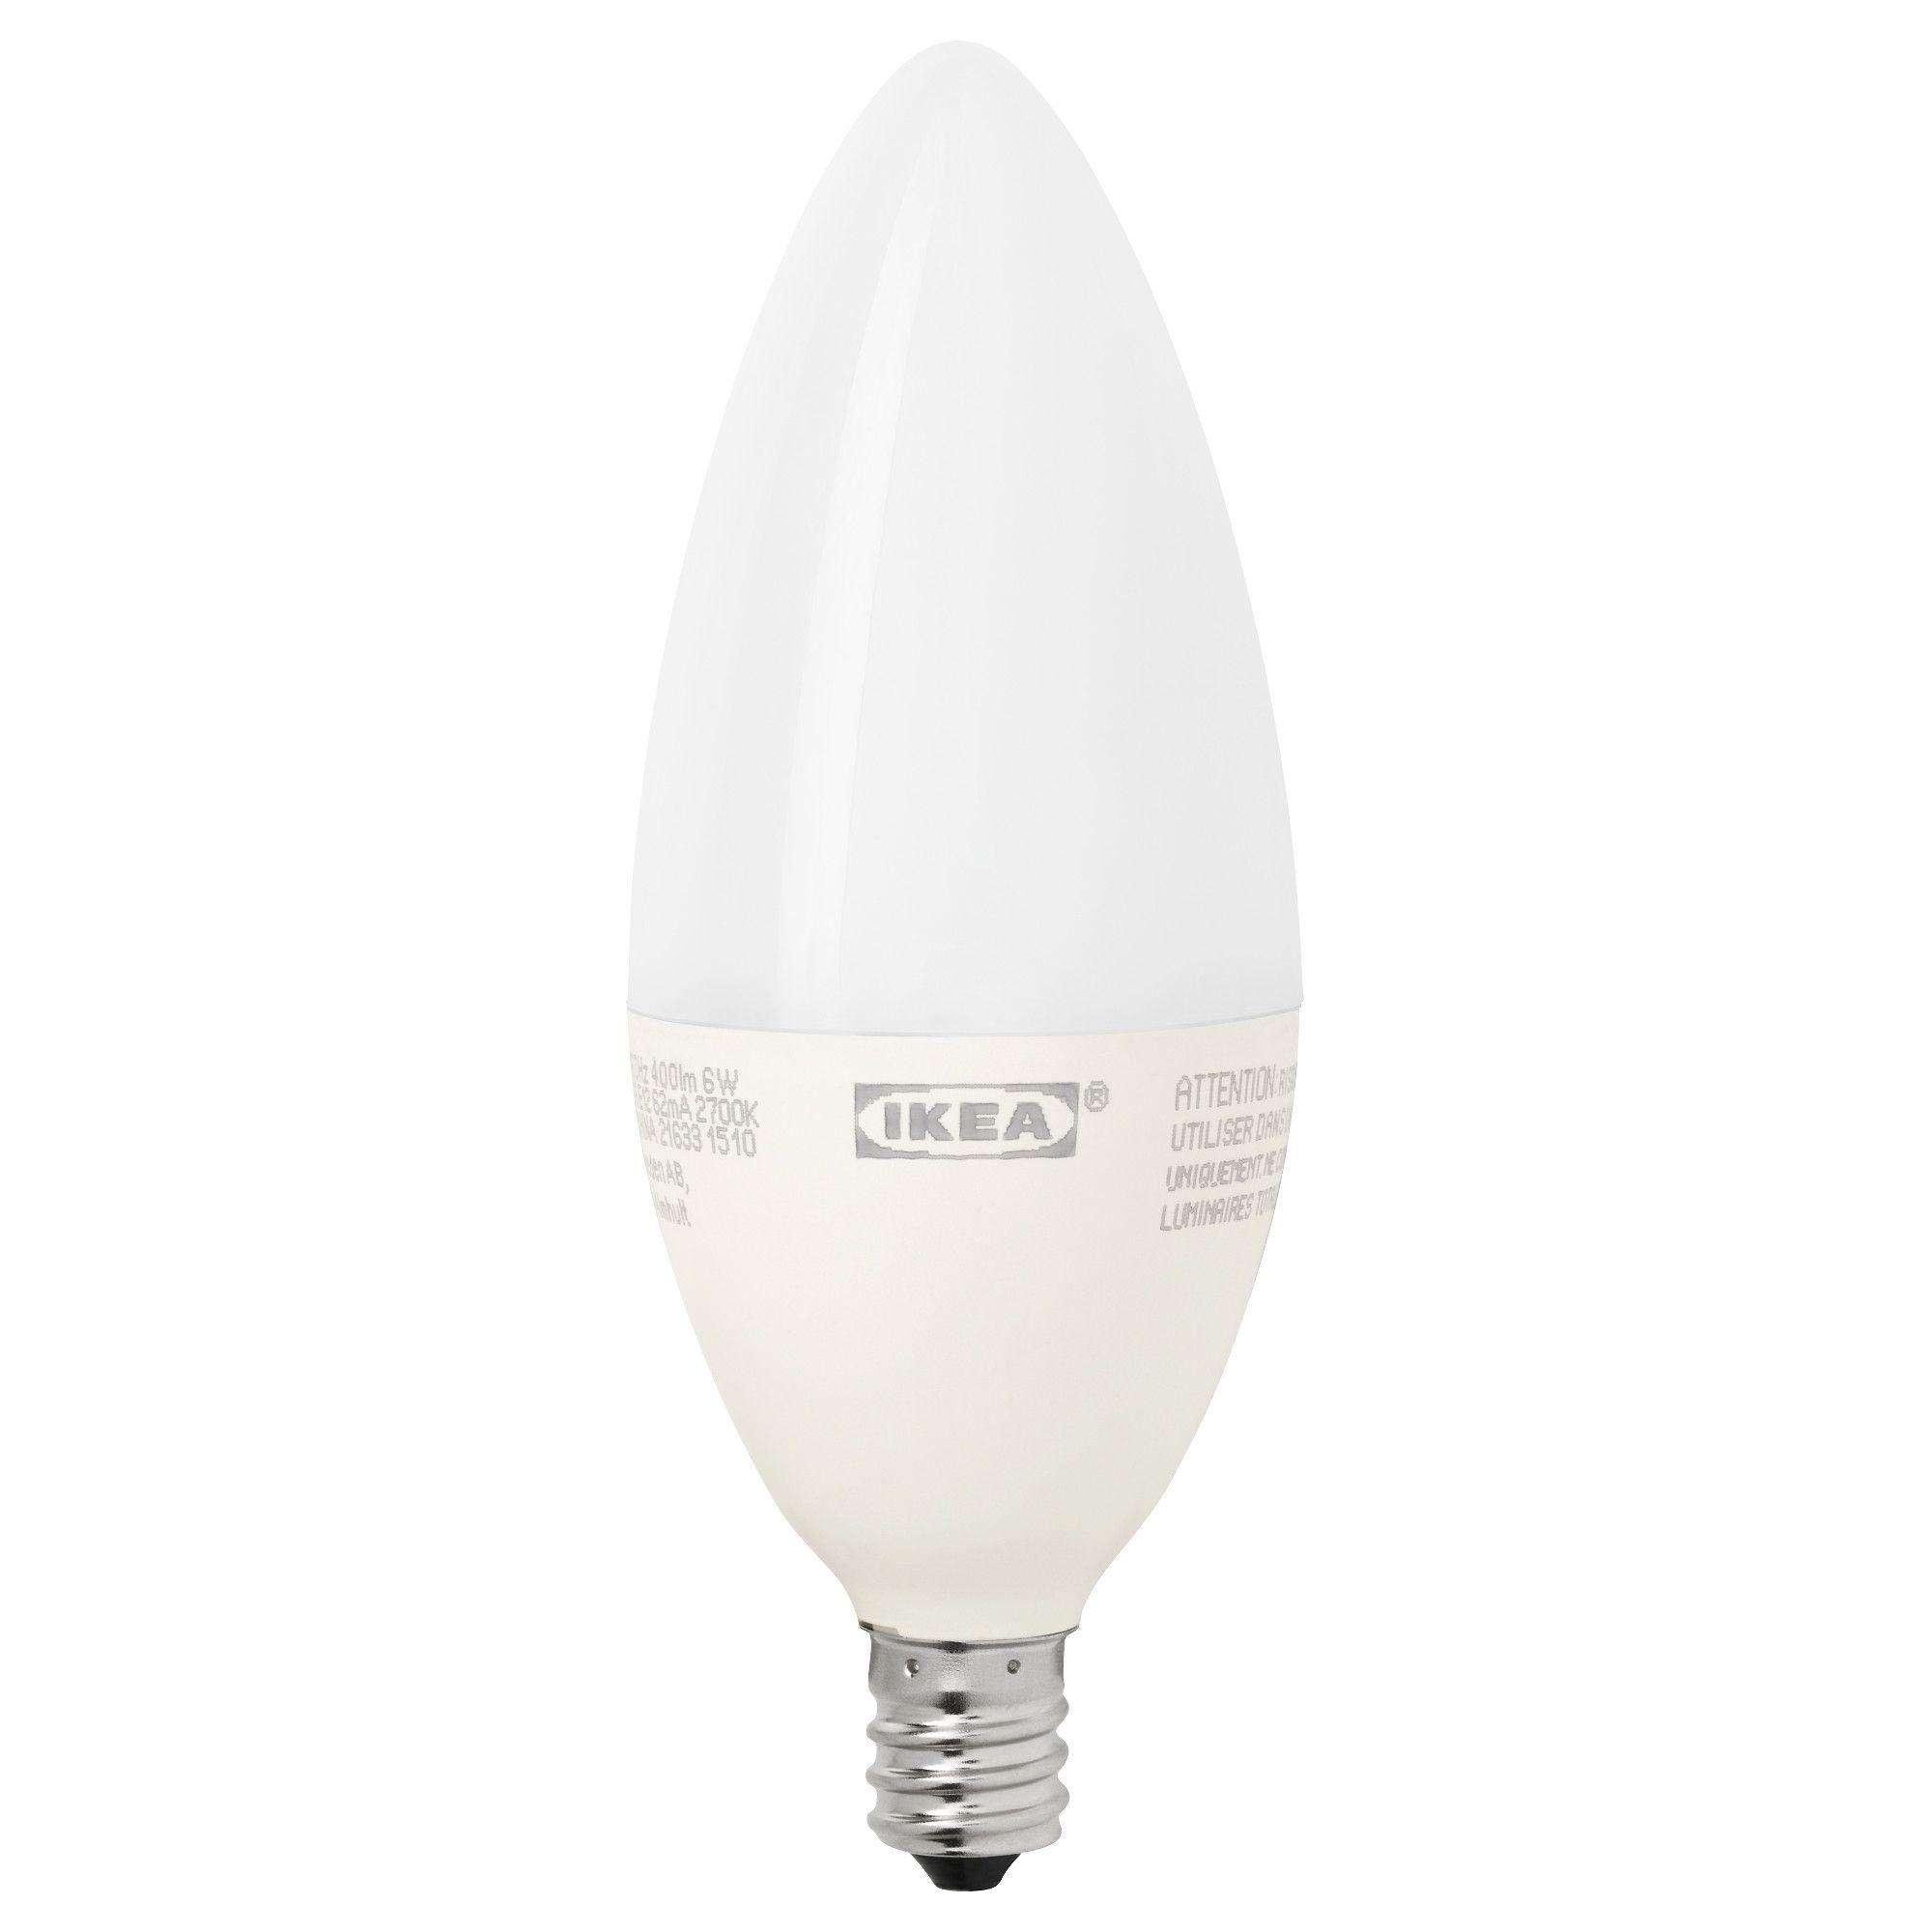 IKEA - LEDARE LED bulb E12 400 lumen dimmable, chandelier opal white ...